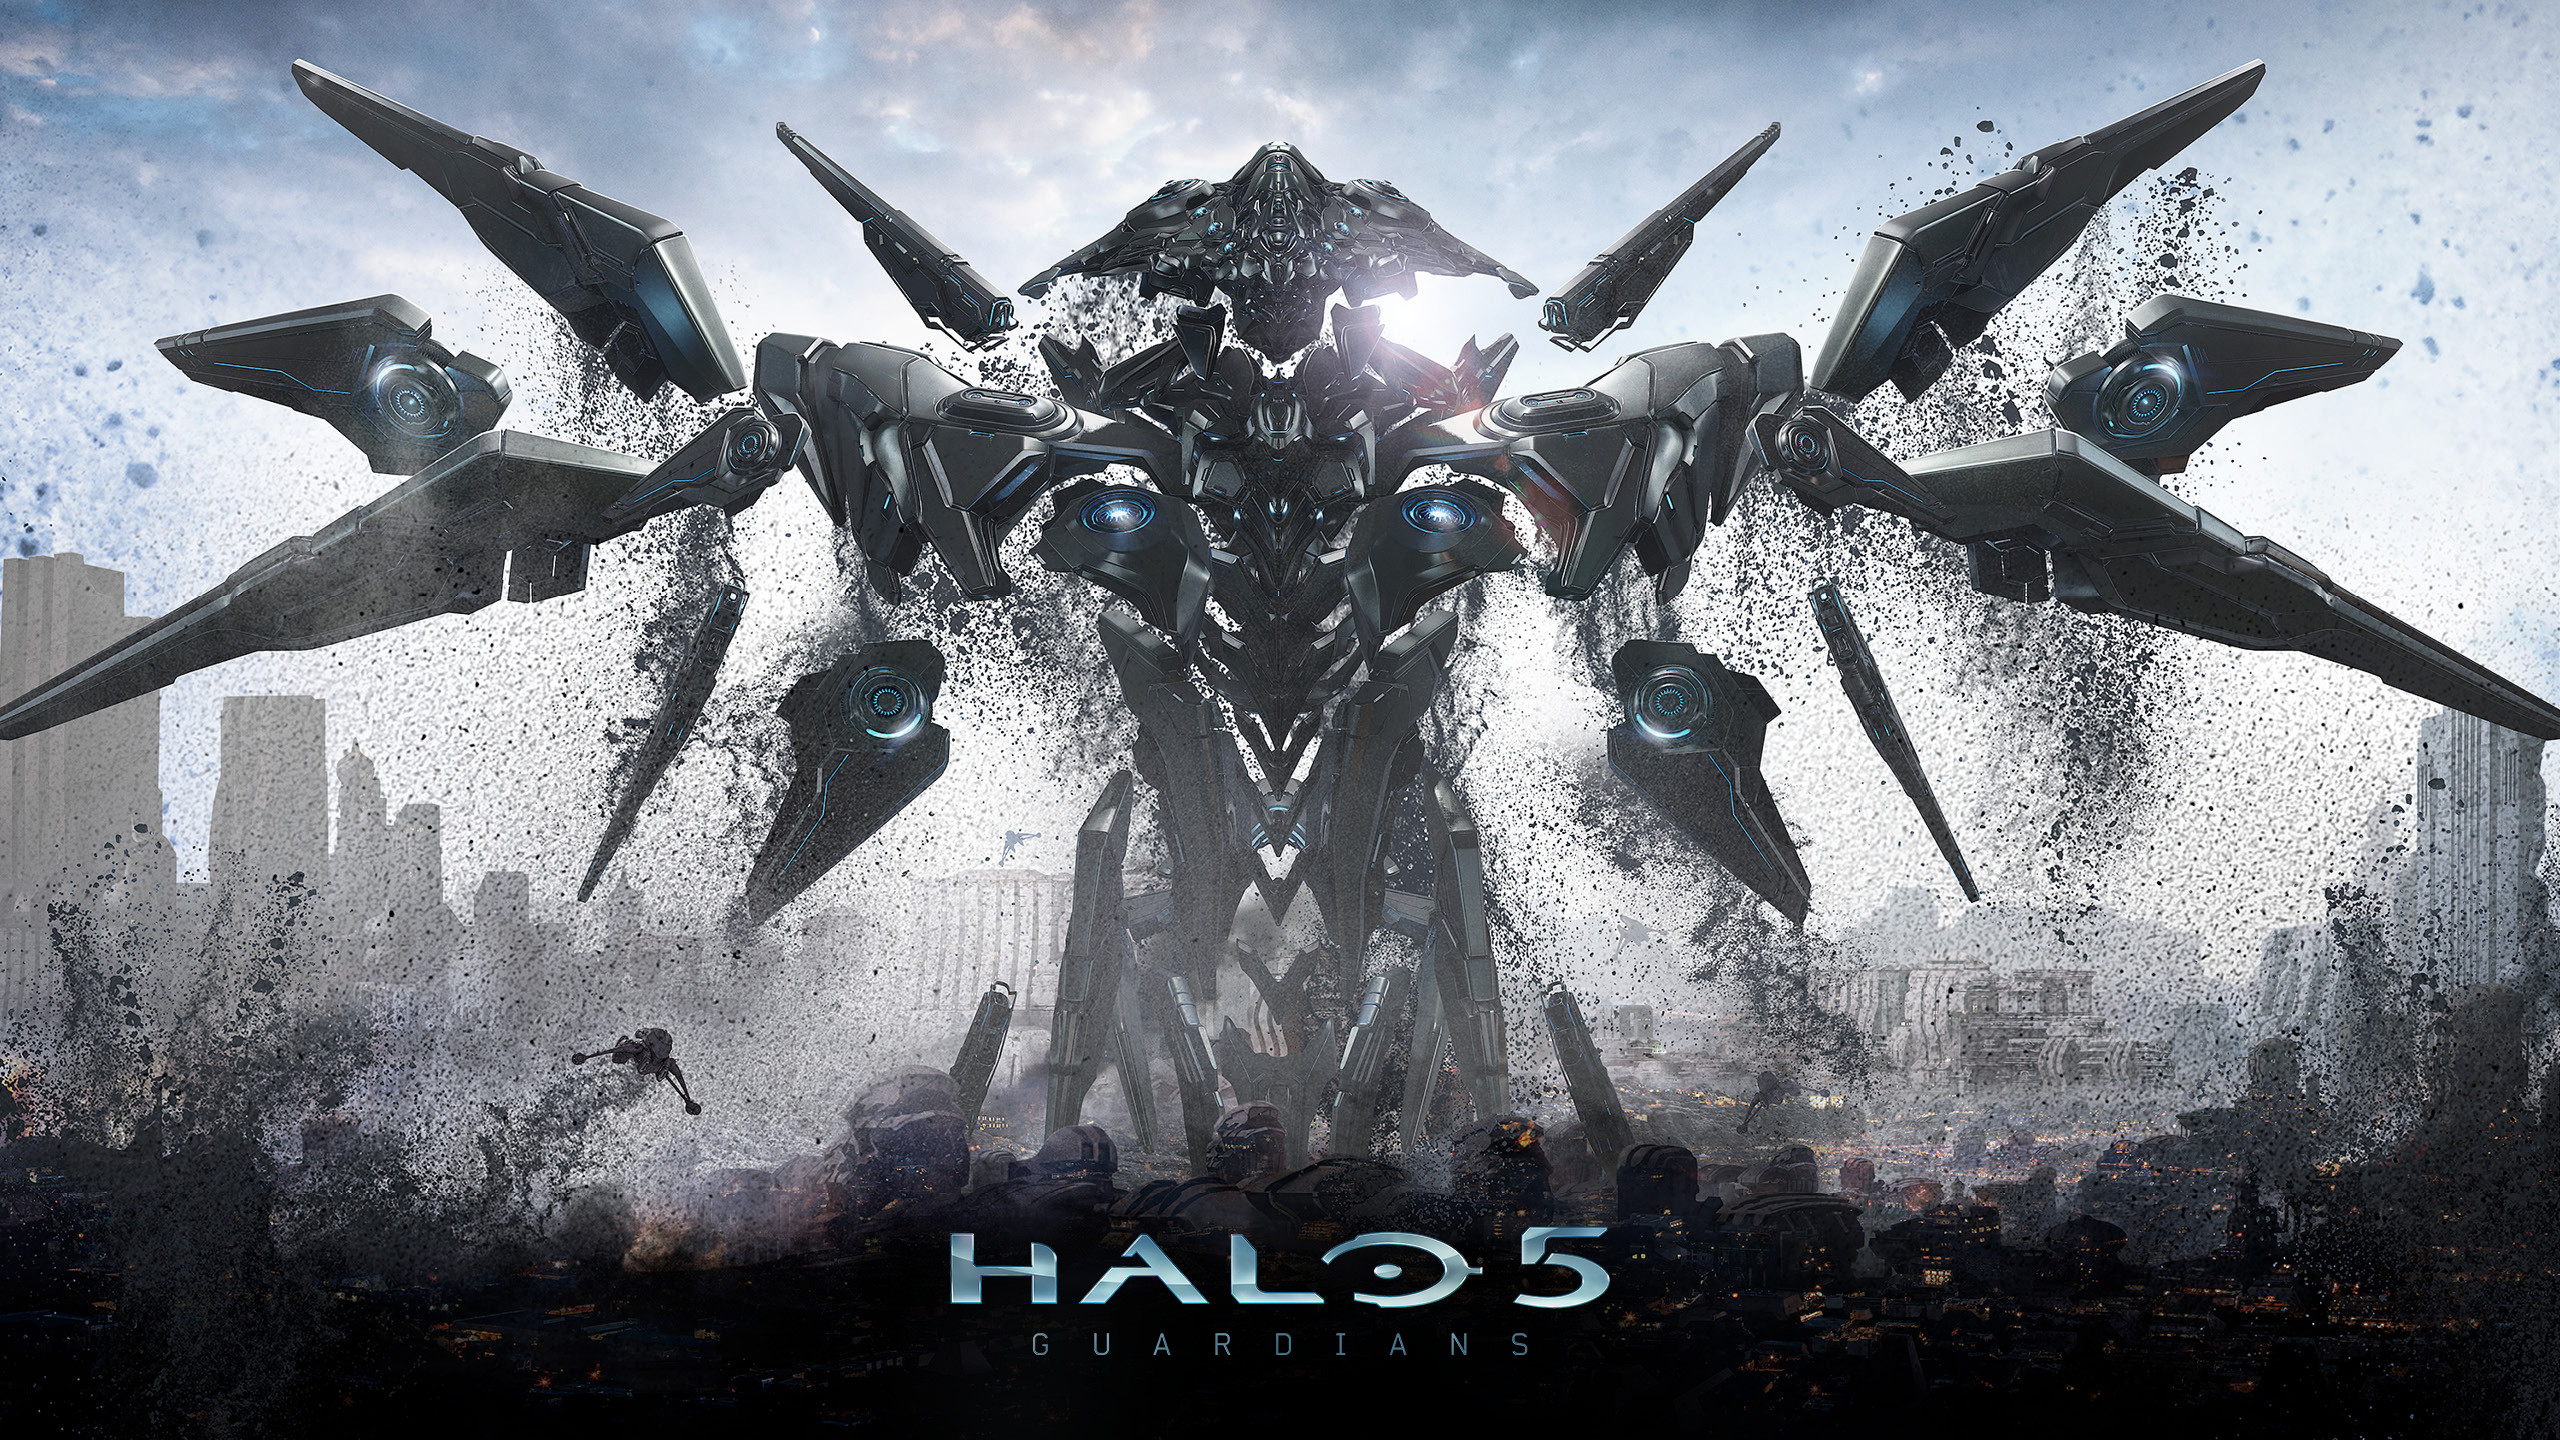 Halo 5: Guardians HD wallpapers, Desktop wallpaper - most viewed